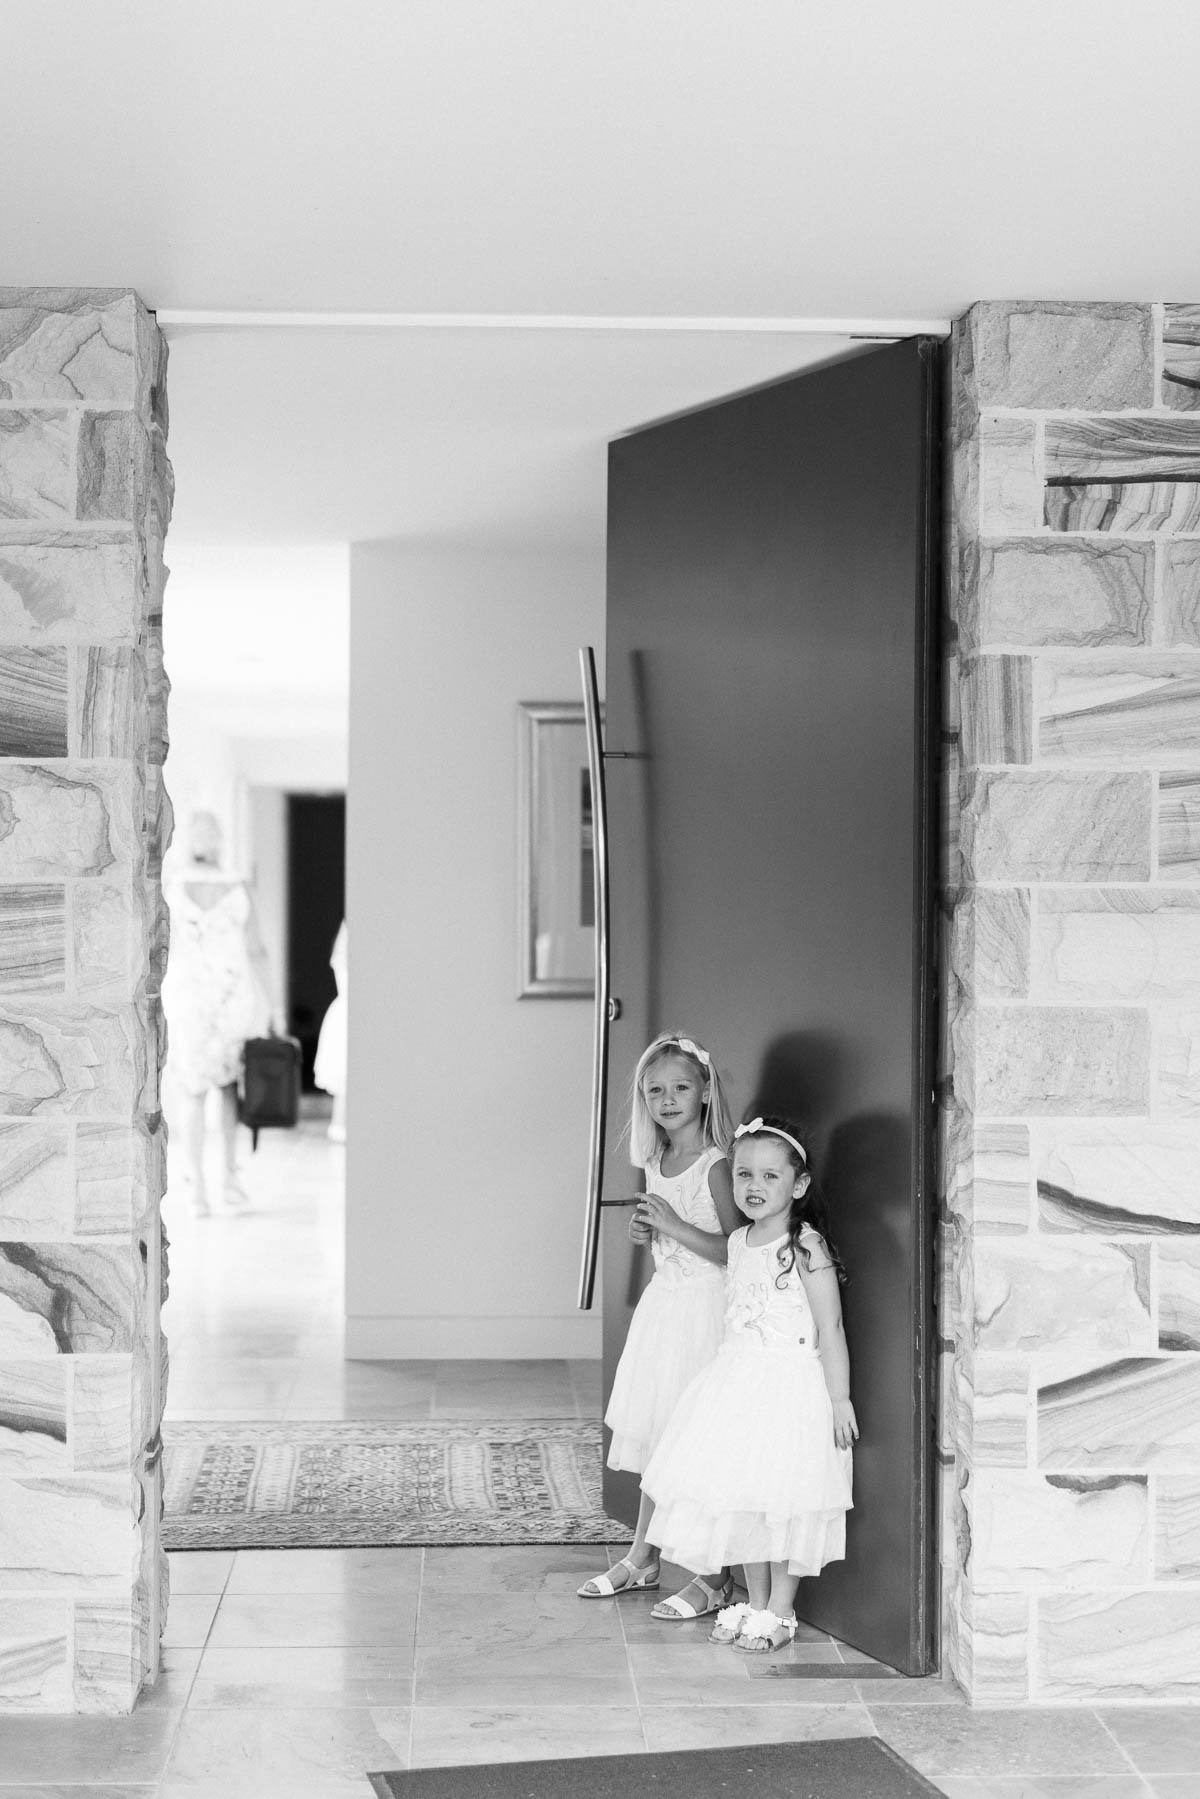 mt-eliza-mornington-peninsula-backyard-wedding-heart+soul-weddings-allison-matt-02979.jpg